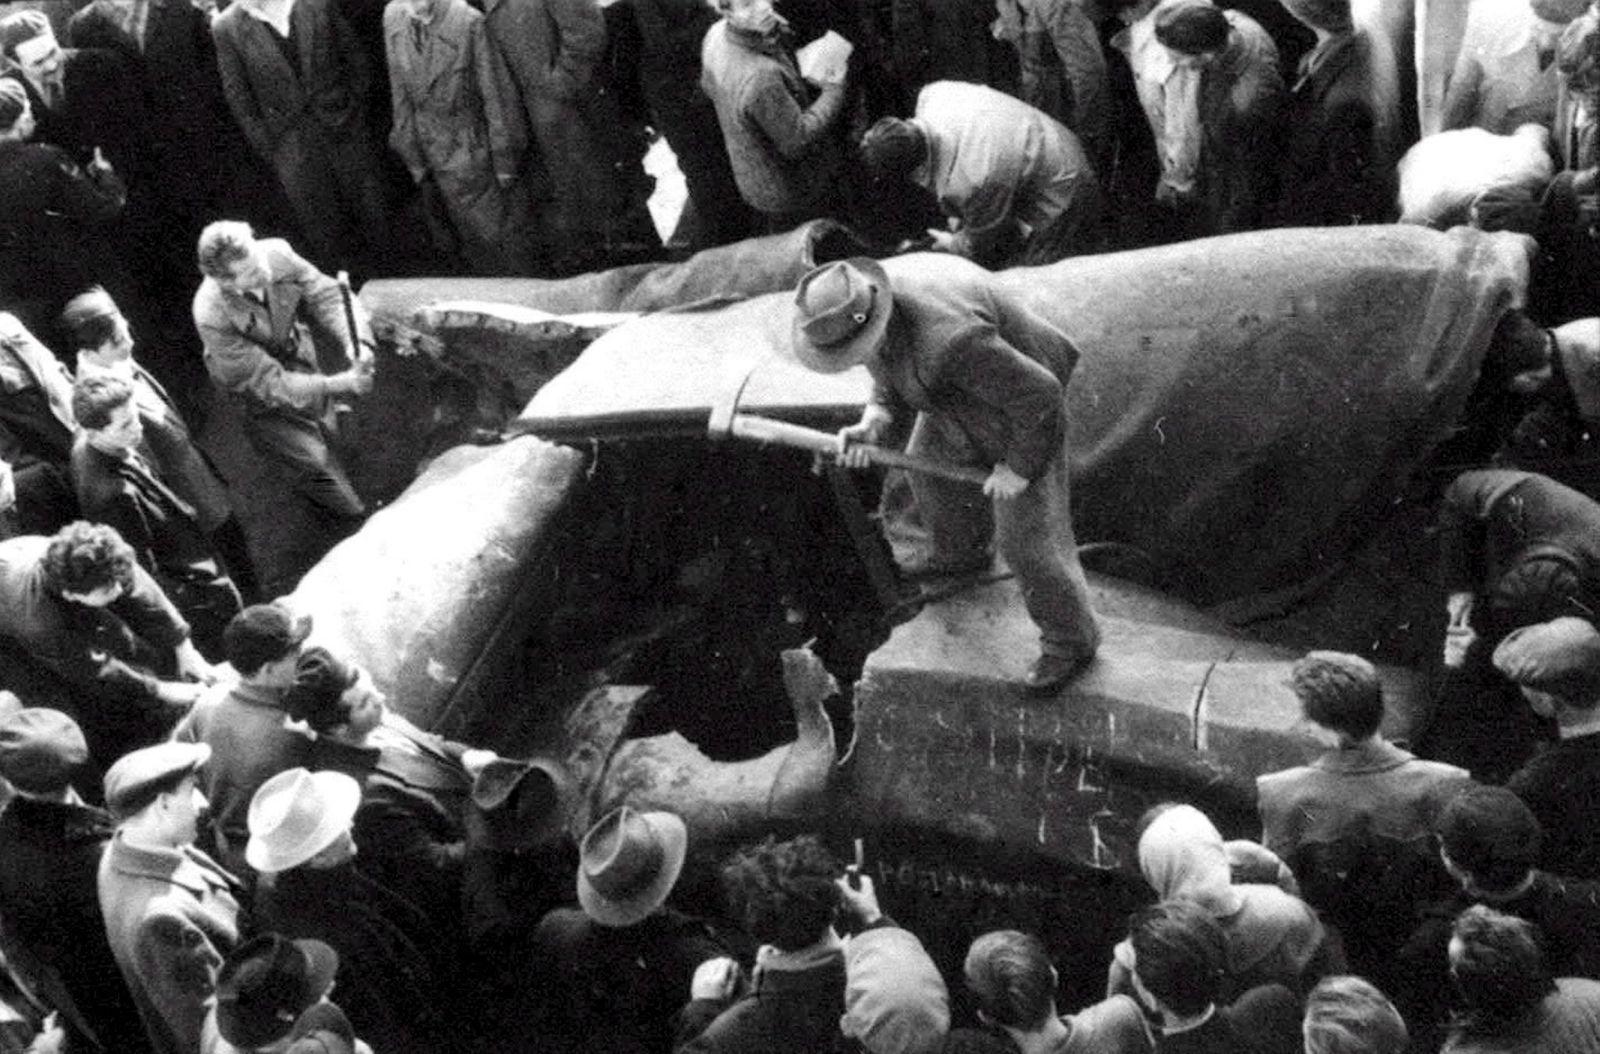 FILES HUNGARY 1956 REVOLUTION